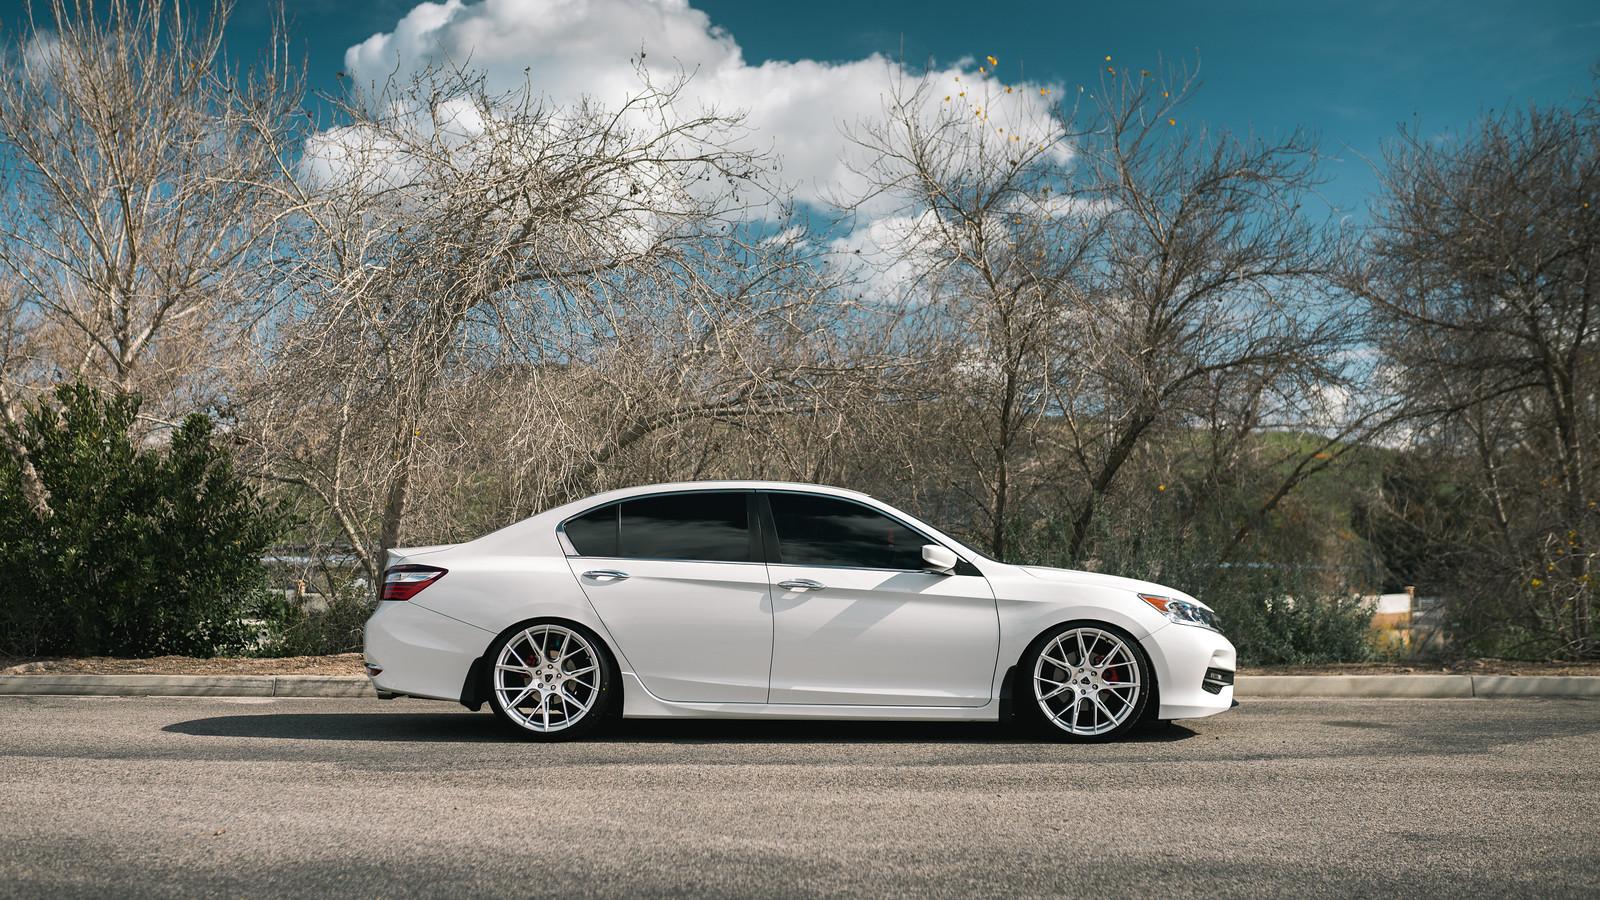 2017_Honda_Accord_Blaque_Diamond_Wheels_BD-F18_Wheels_Brushed_Silver (16)